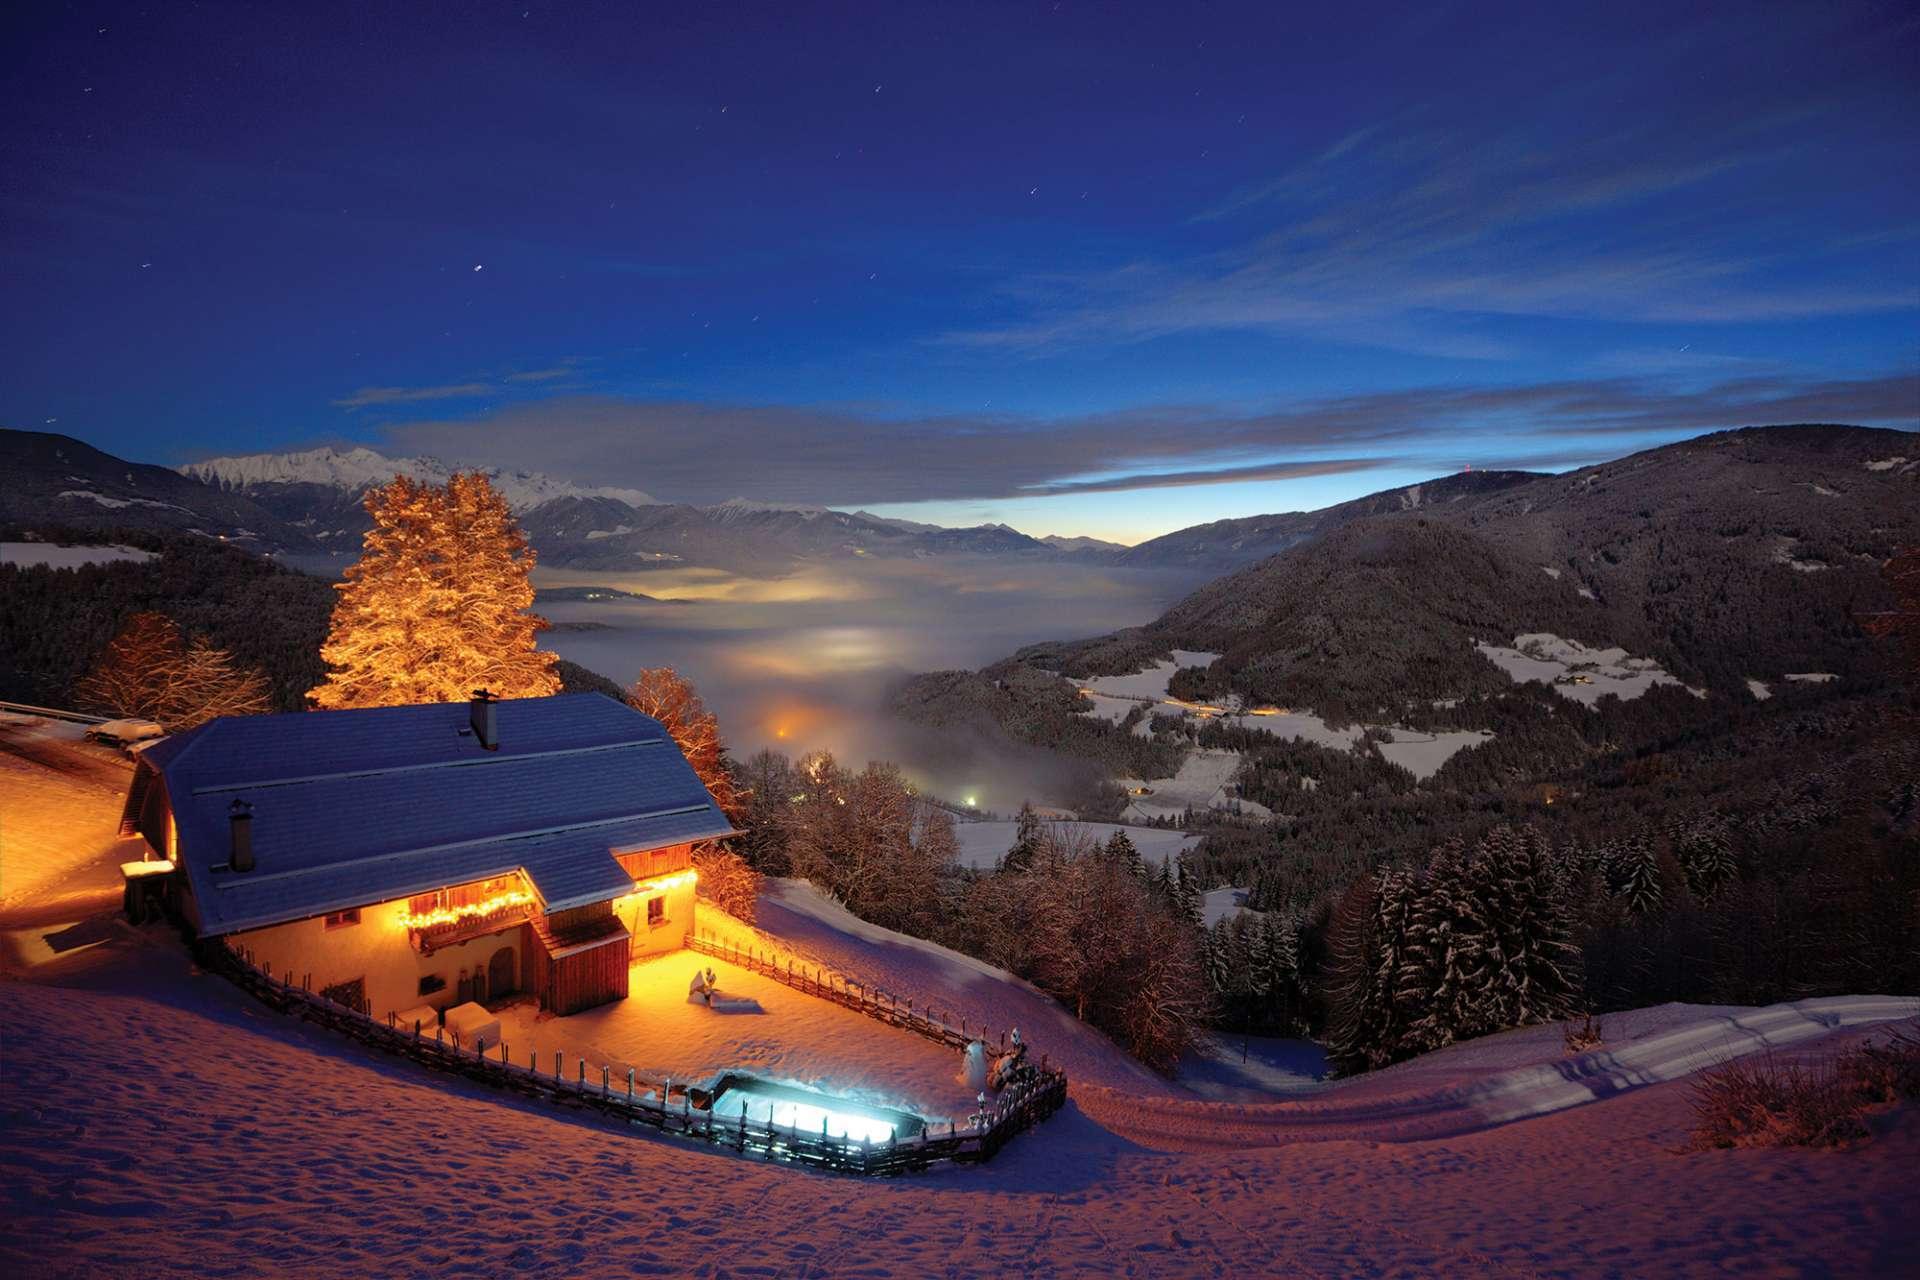 A unique Ski experience in Italy